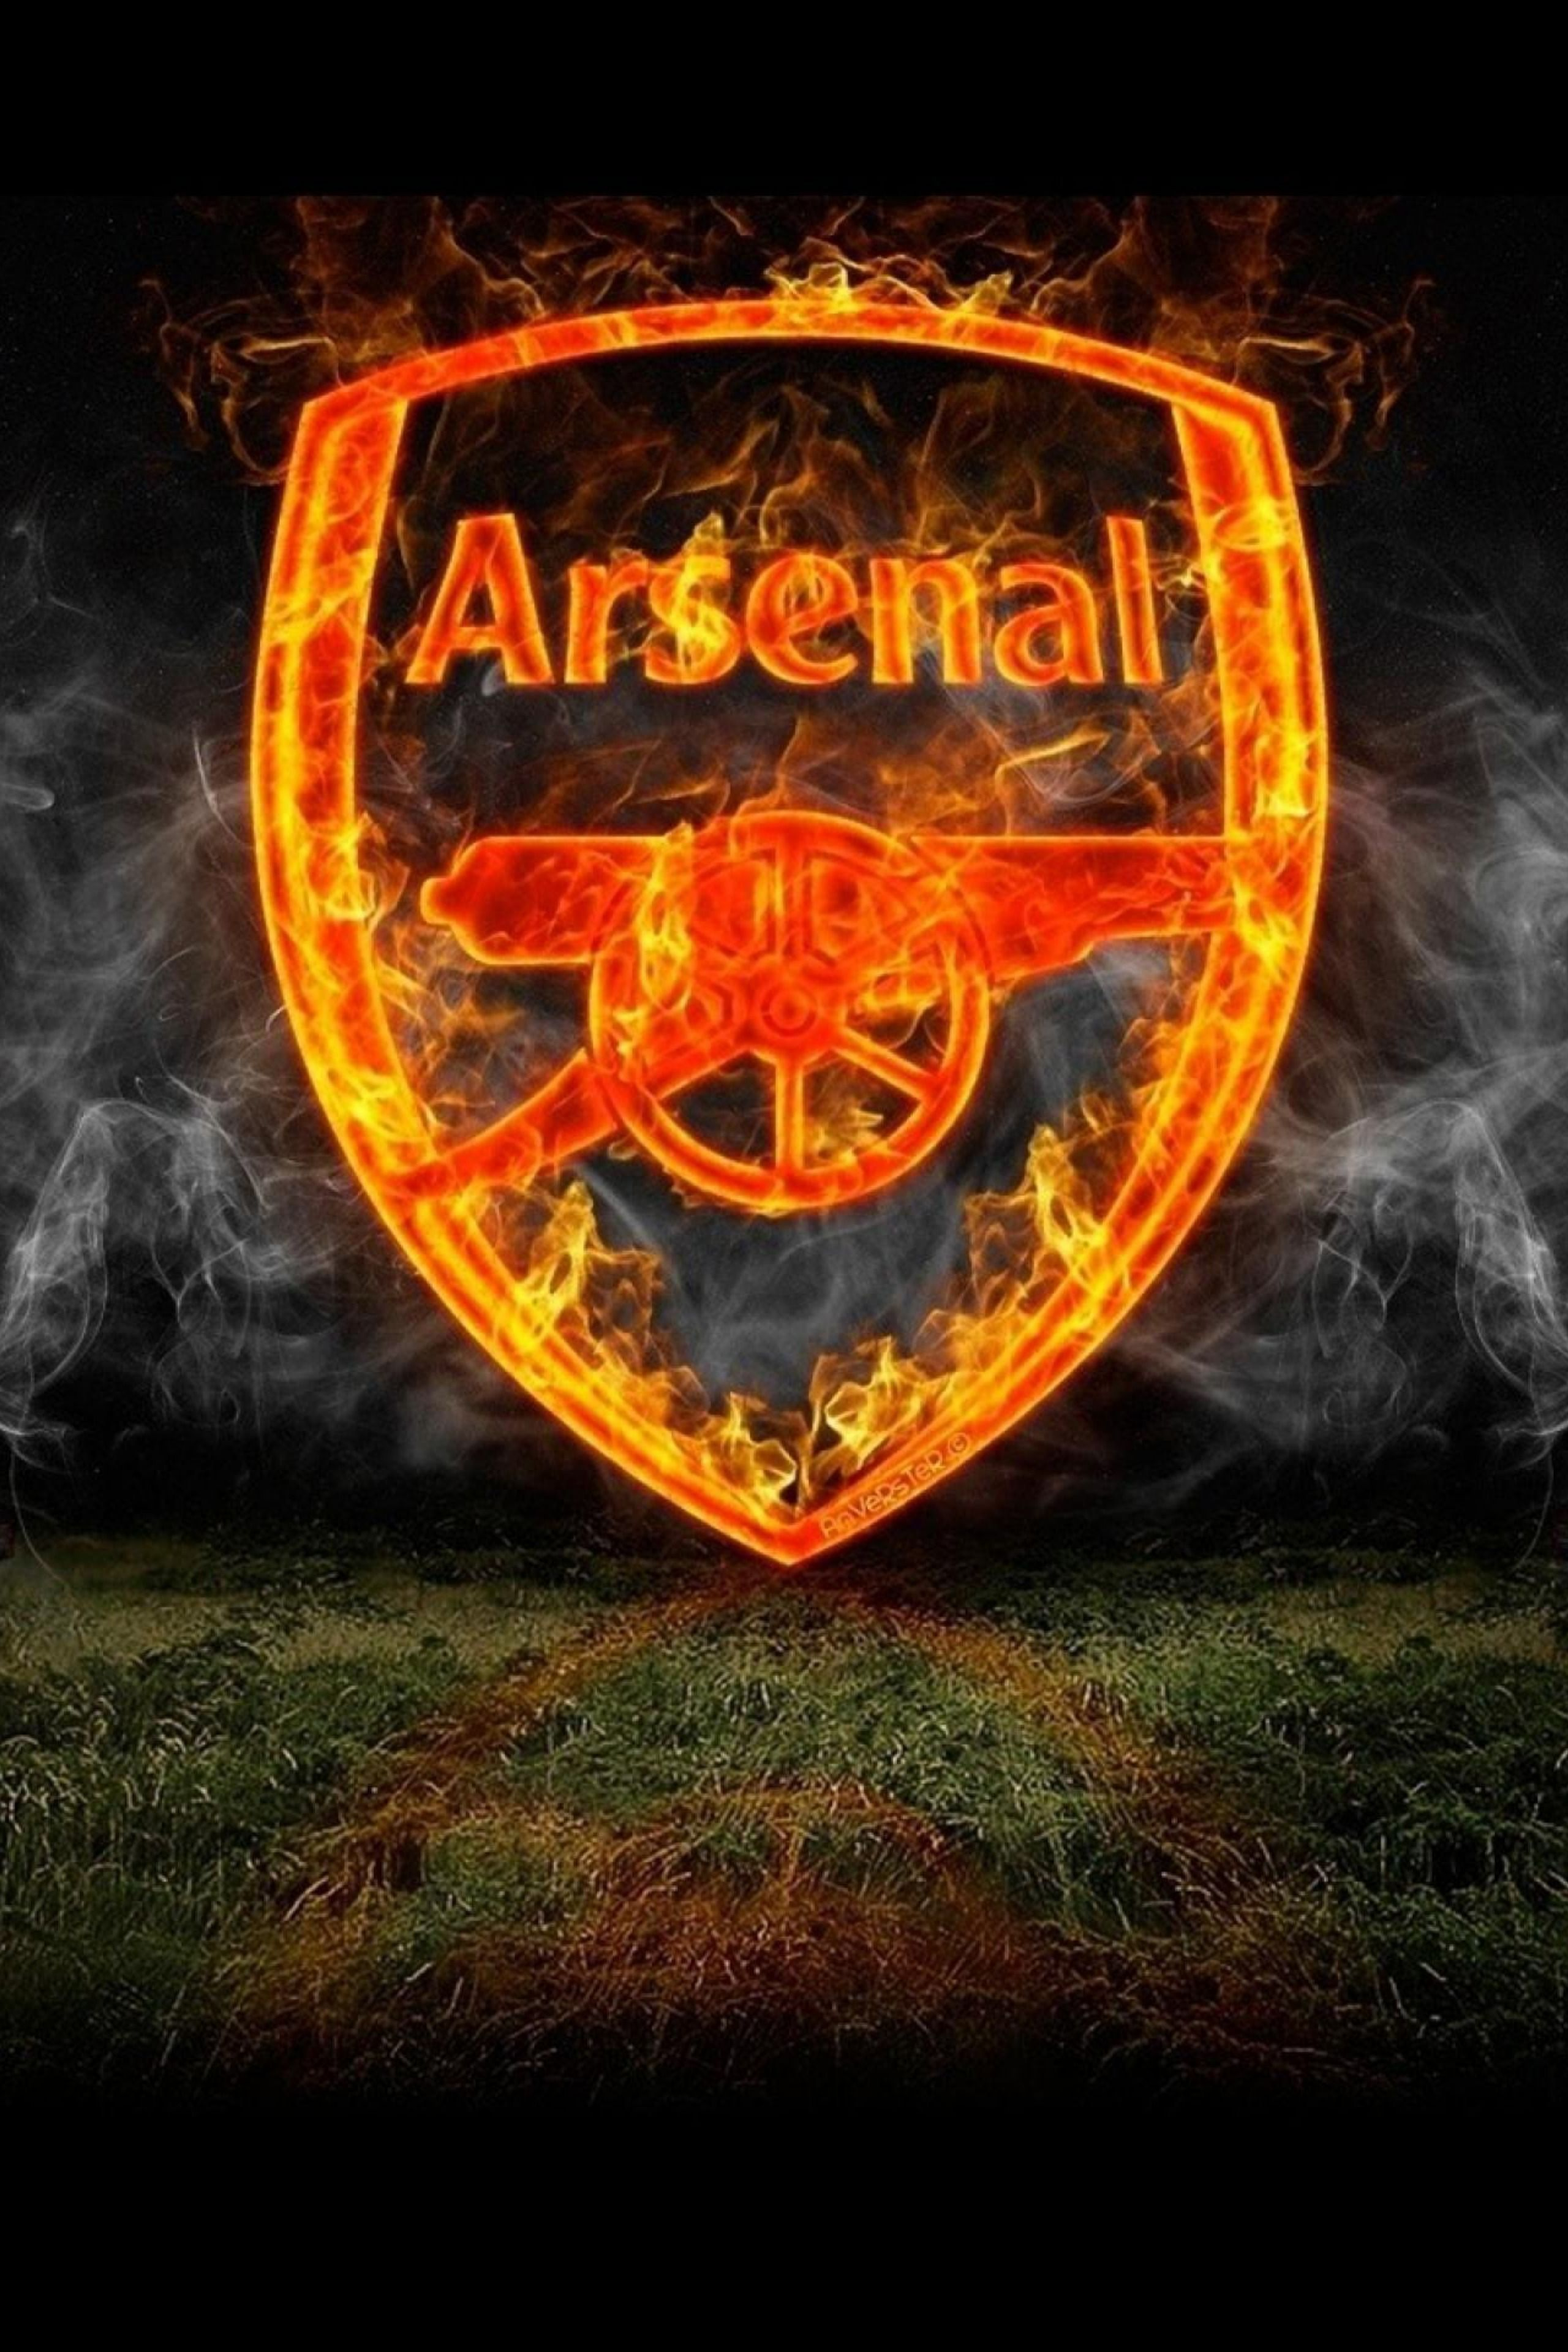 Arsenal mobile wallpaper hd arsenal wallpapers sports